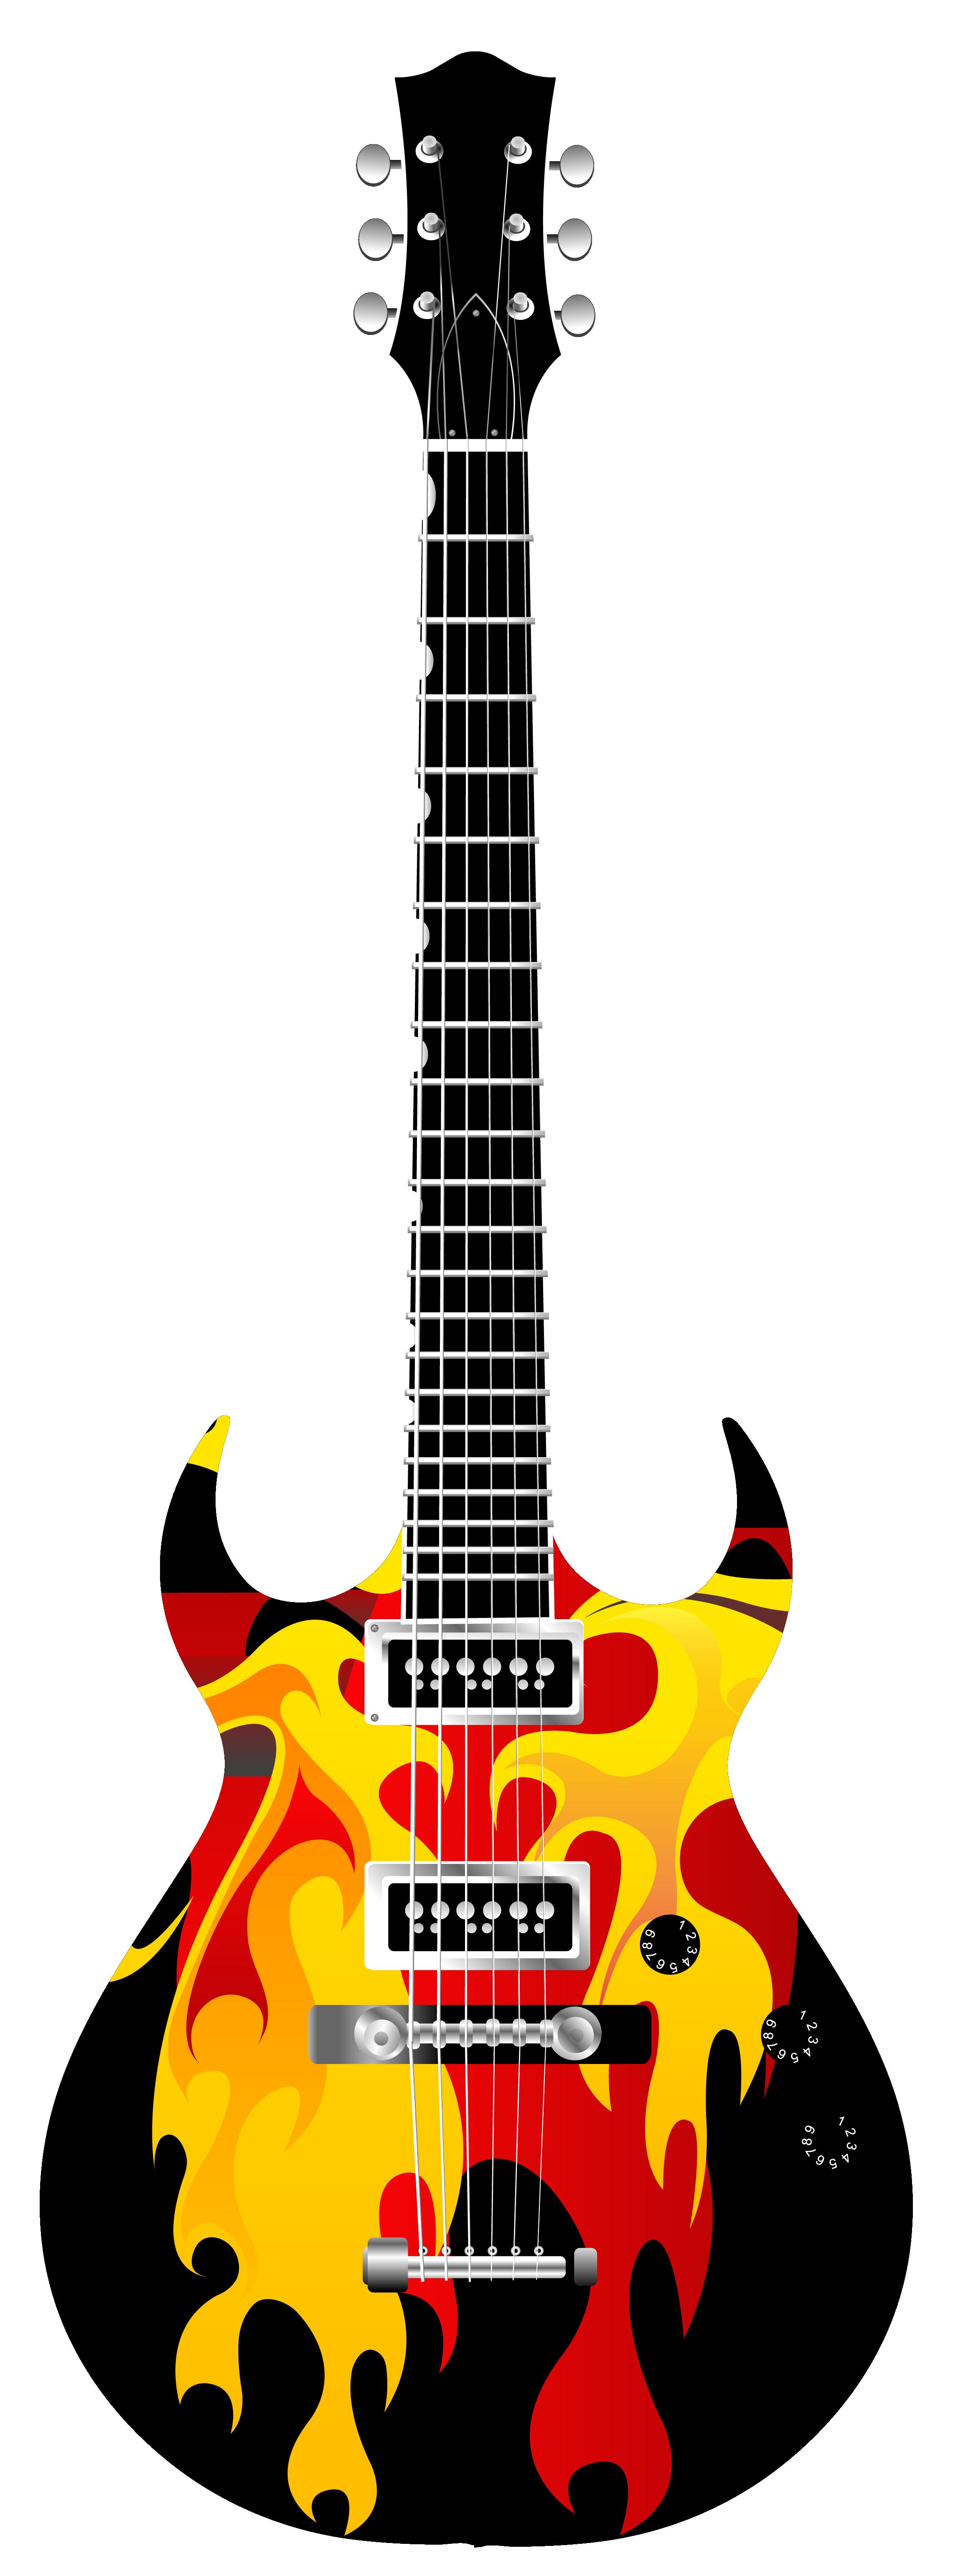 Flame Electric Guitar Png Image Electric Guitar Guitar Cool Guitar